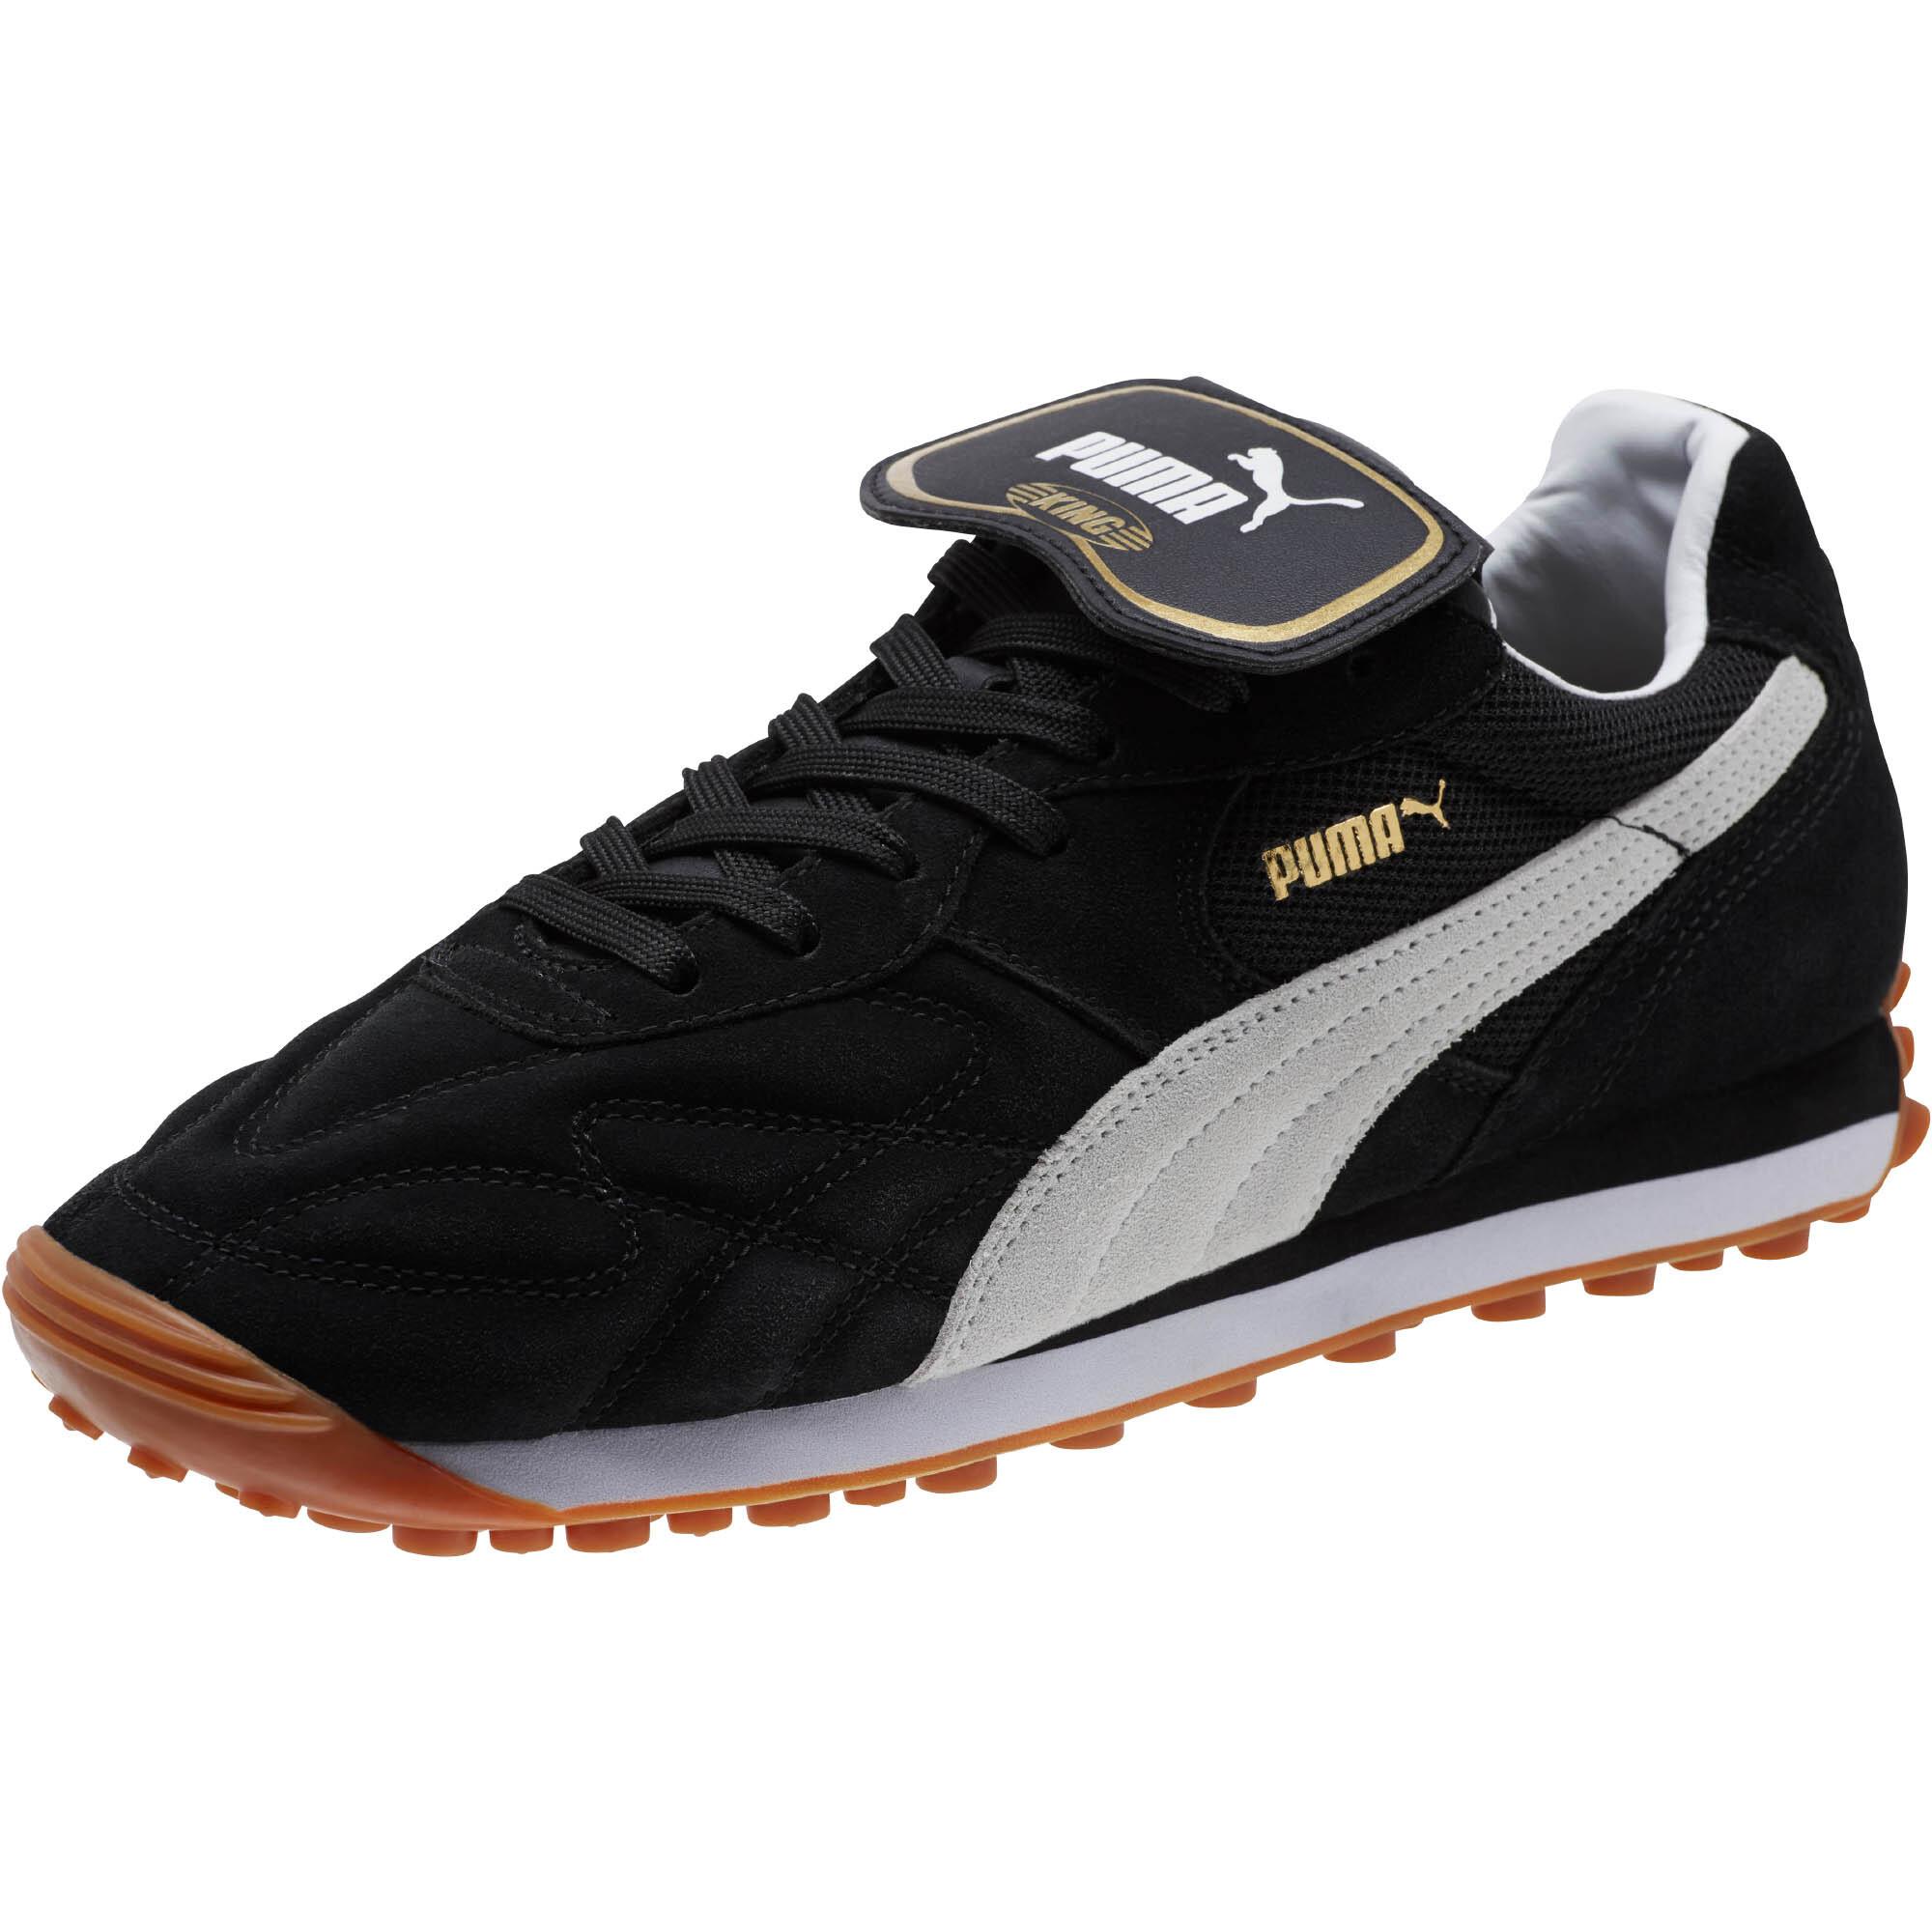 PUMA-King-Avanti-Soccer-Cleats-Unisex-Shoe-Sport-Classics thumbnail 4